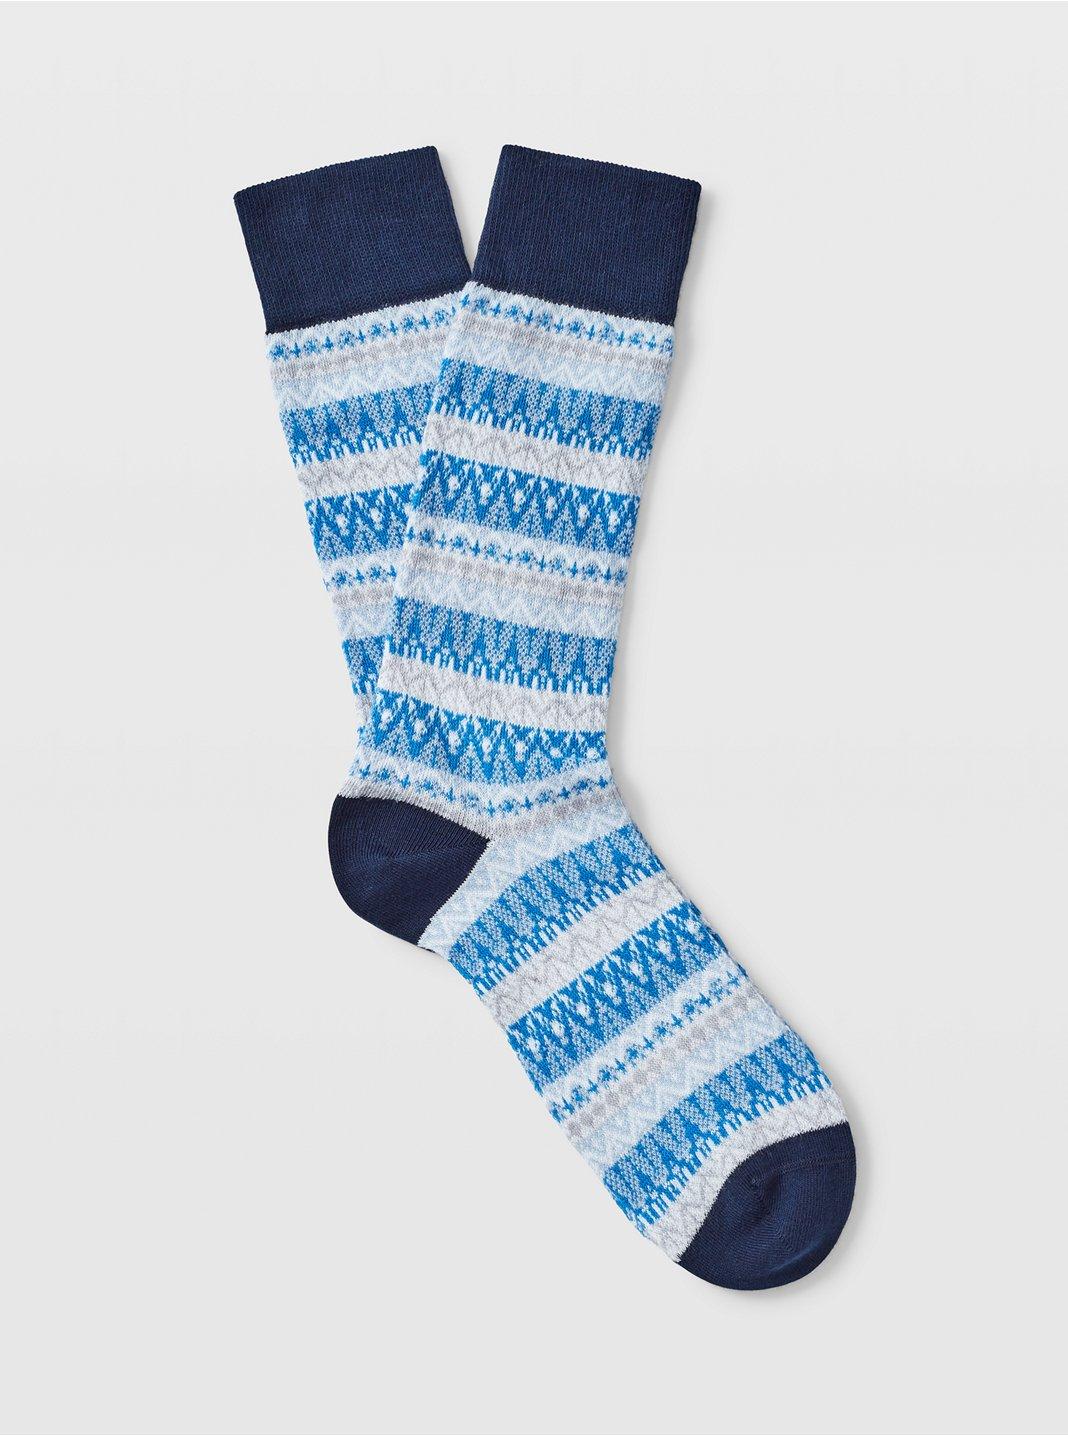 Icicle Socks